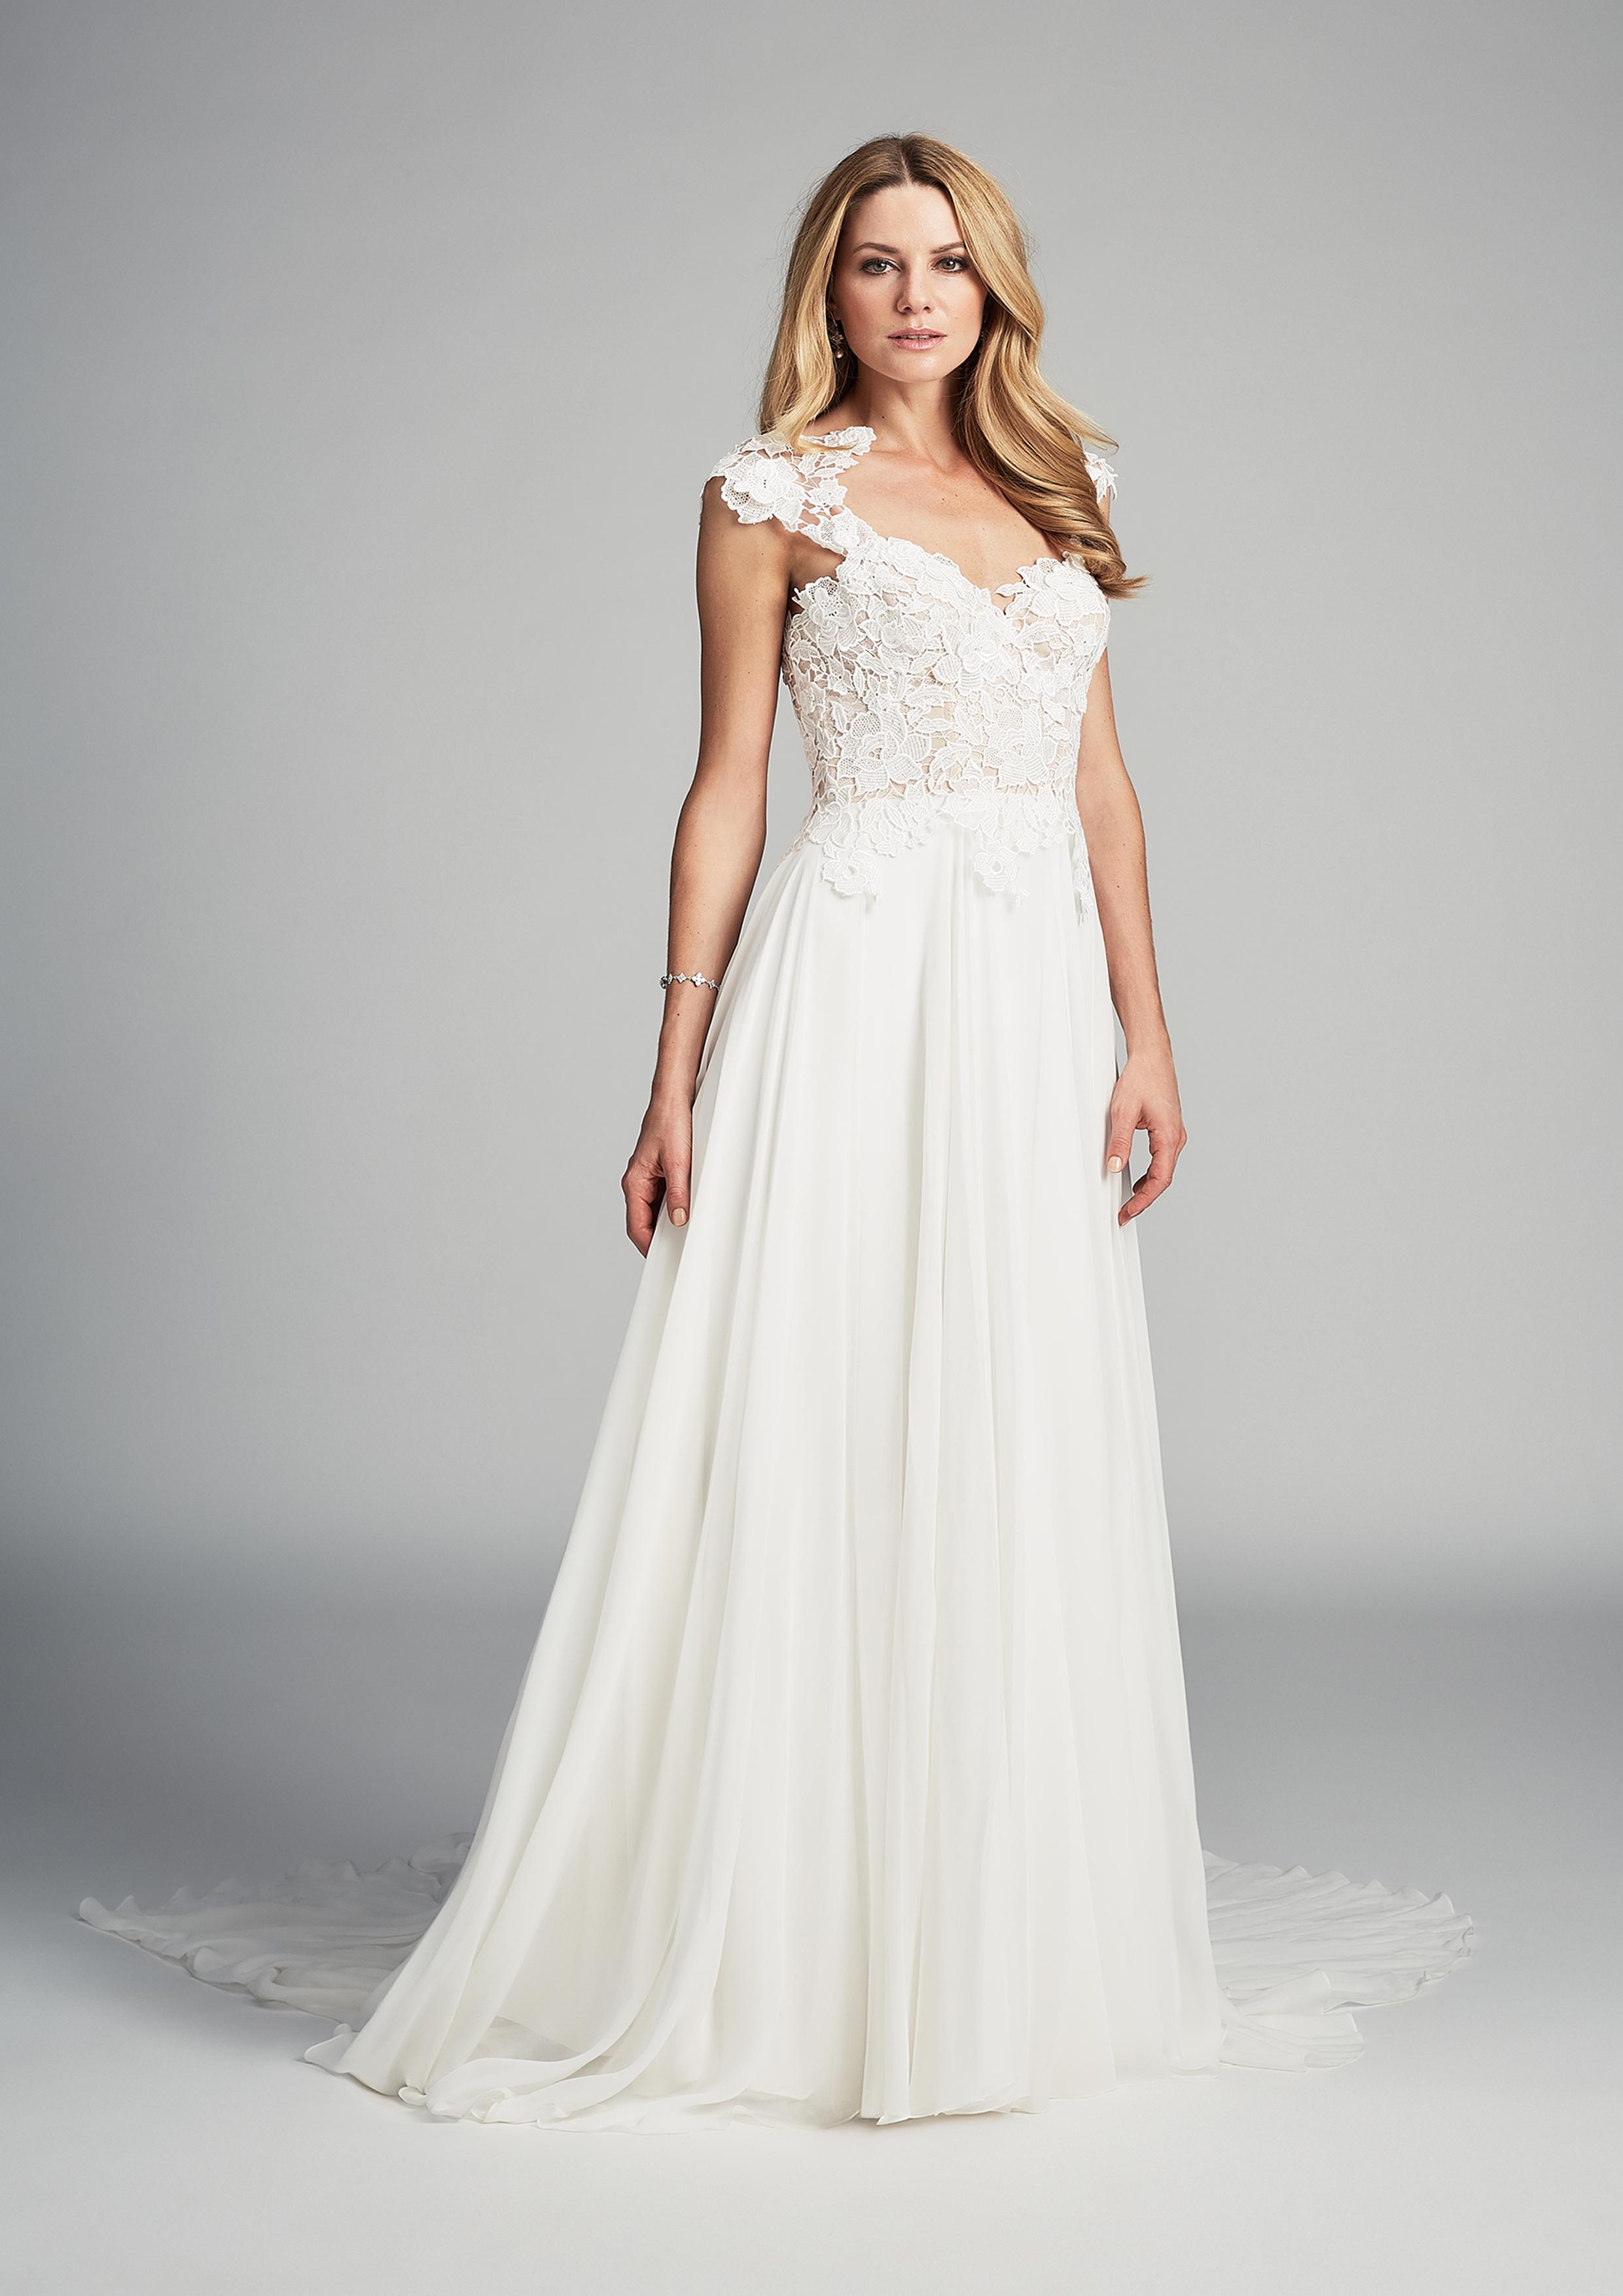 Morning designer wedding gown by Caroline Castigliano